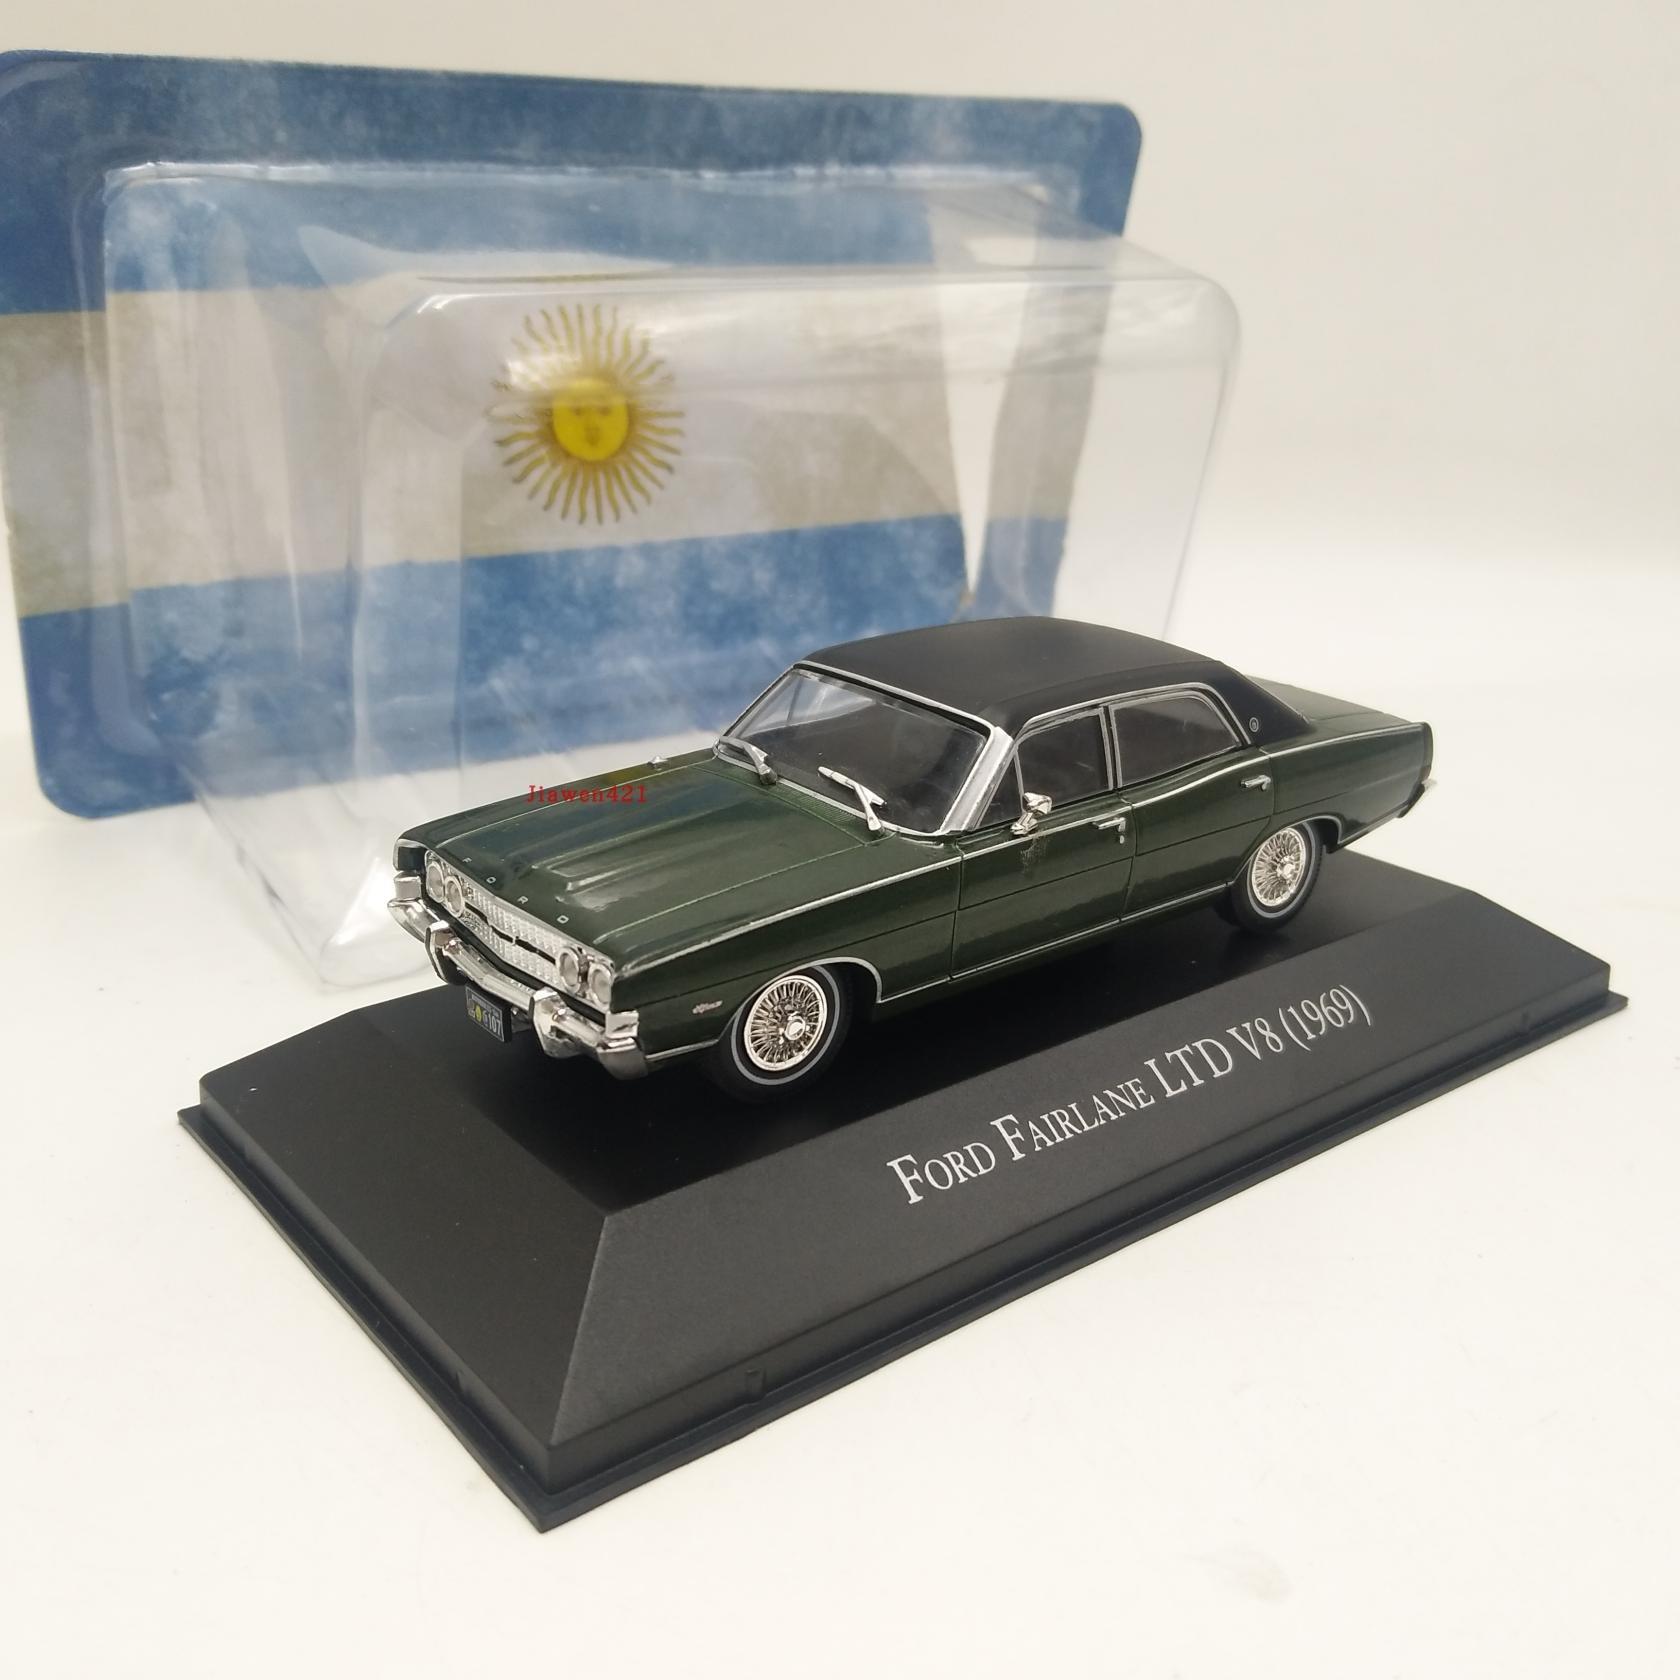 IXO Altaya 1:43 Dodge Polara RT 1974 Diecast Models Limited Edition Collection